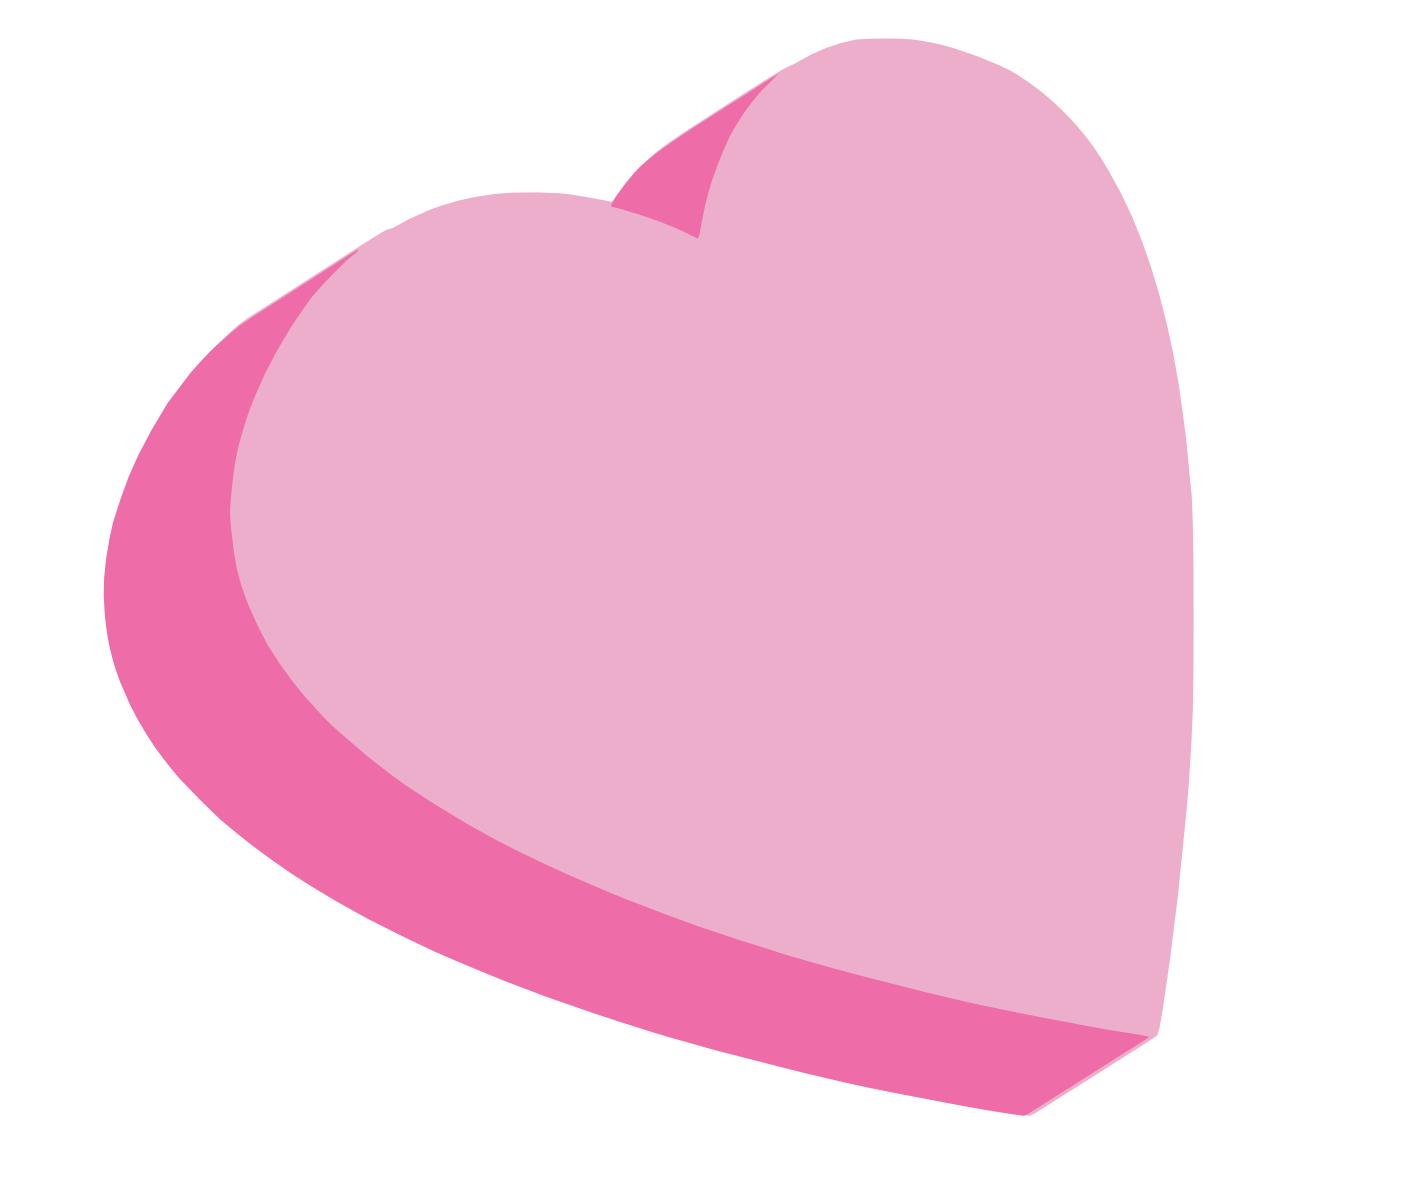 Candy Heart Svg